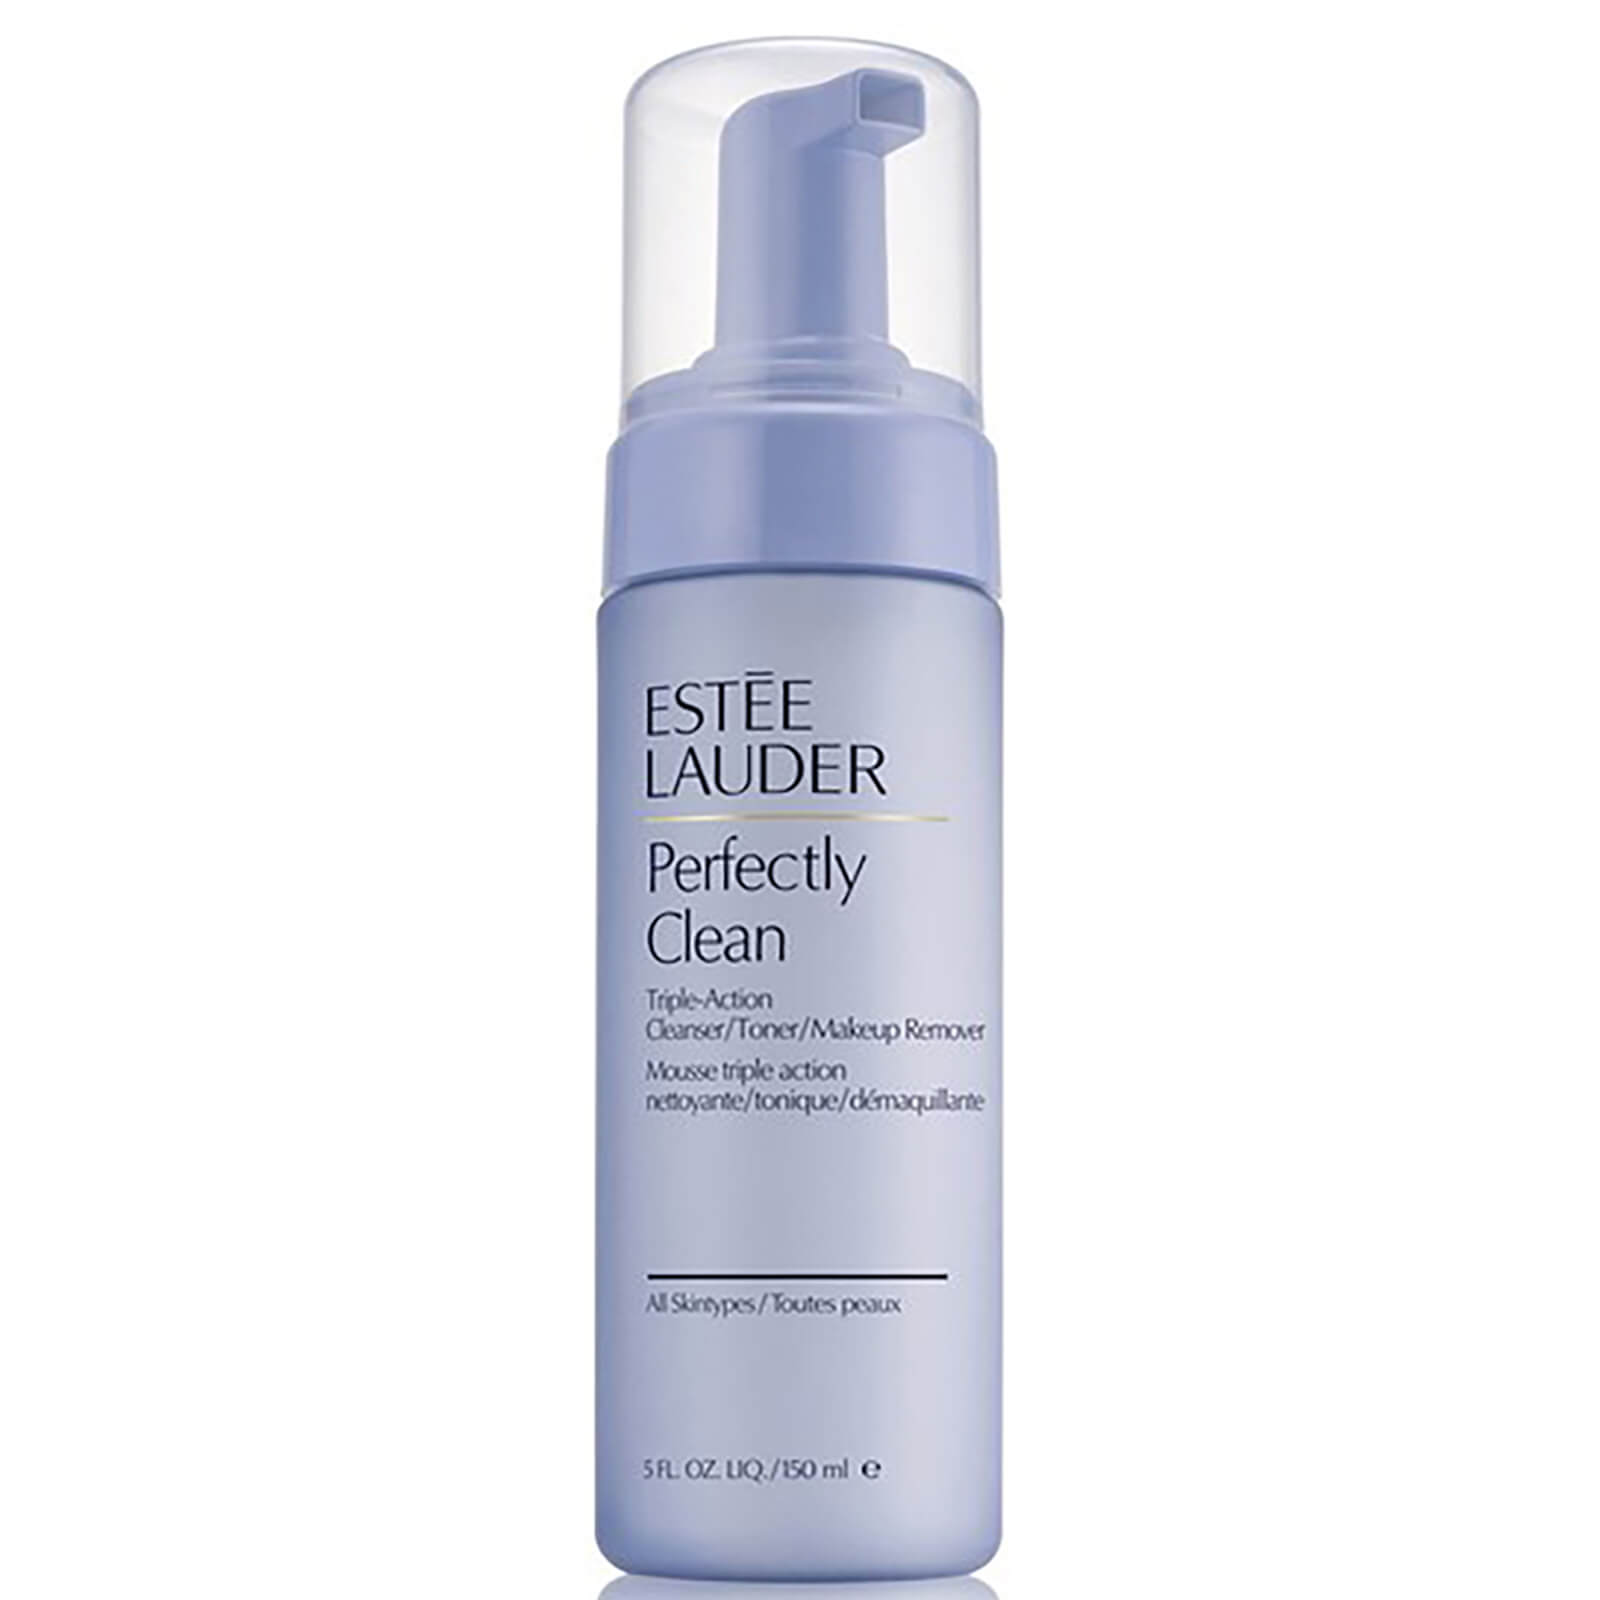 1 Cleanser Toner Makeup Remover 150ml